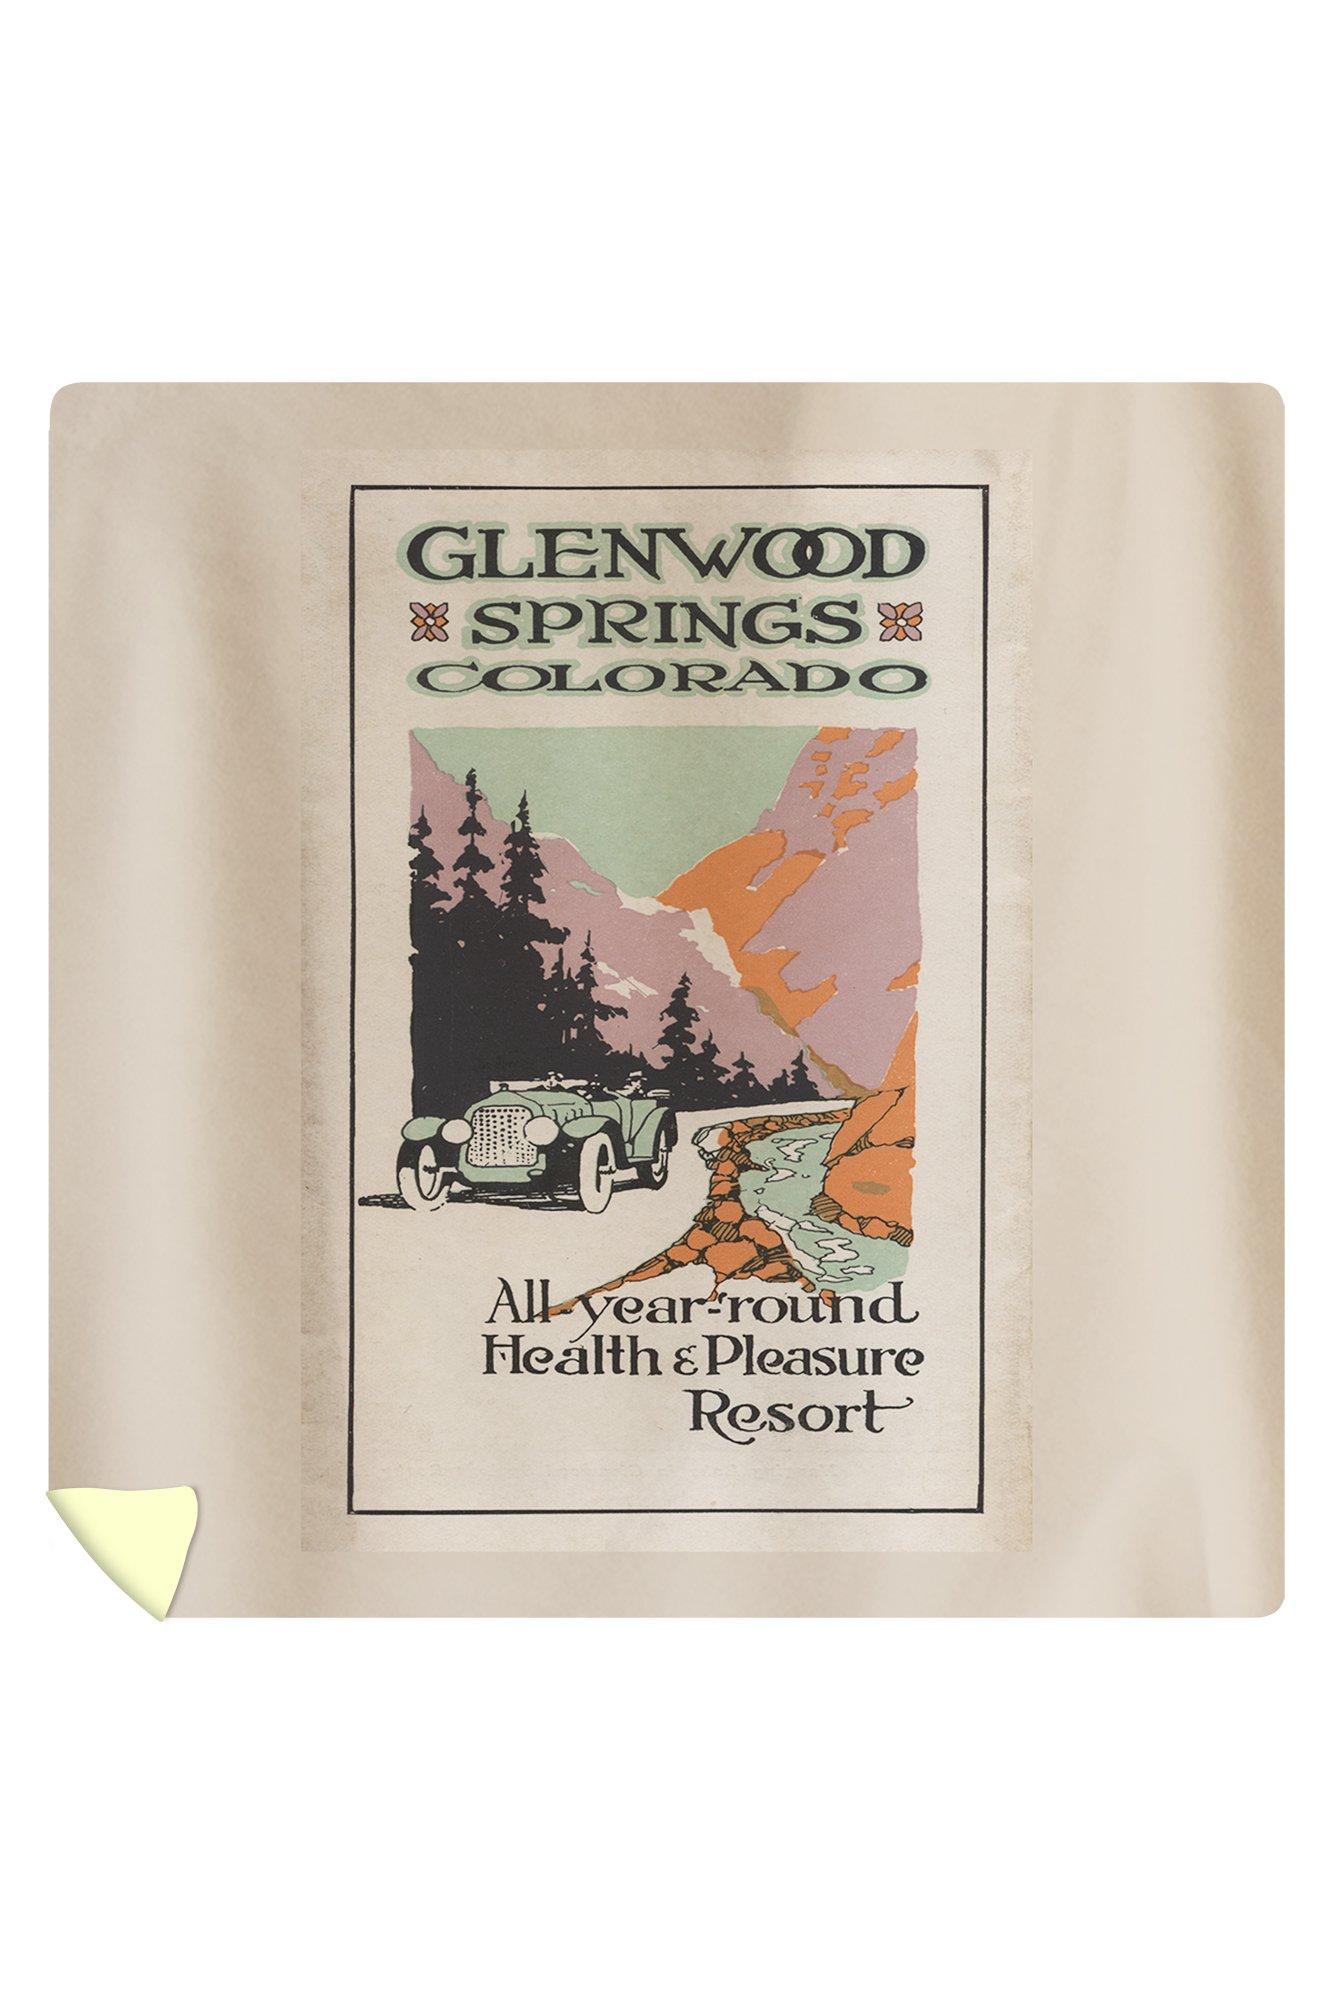 Glenwood Springs, Colorado - Health Resort #1 - Vintage Advertisement (88x88 Queen Microfiber Duvet Cover)